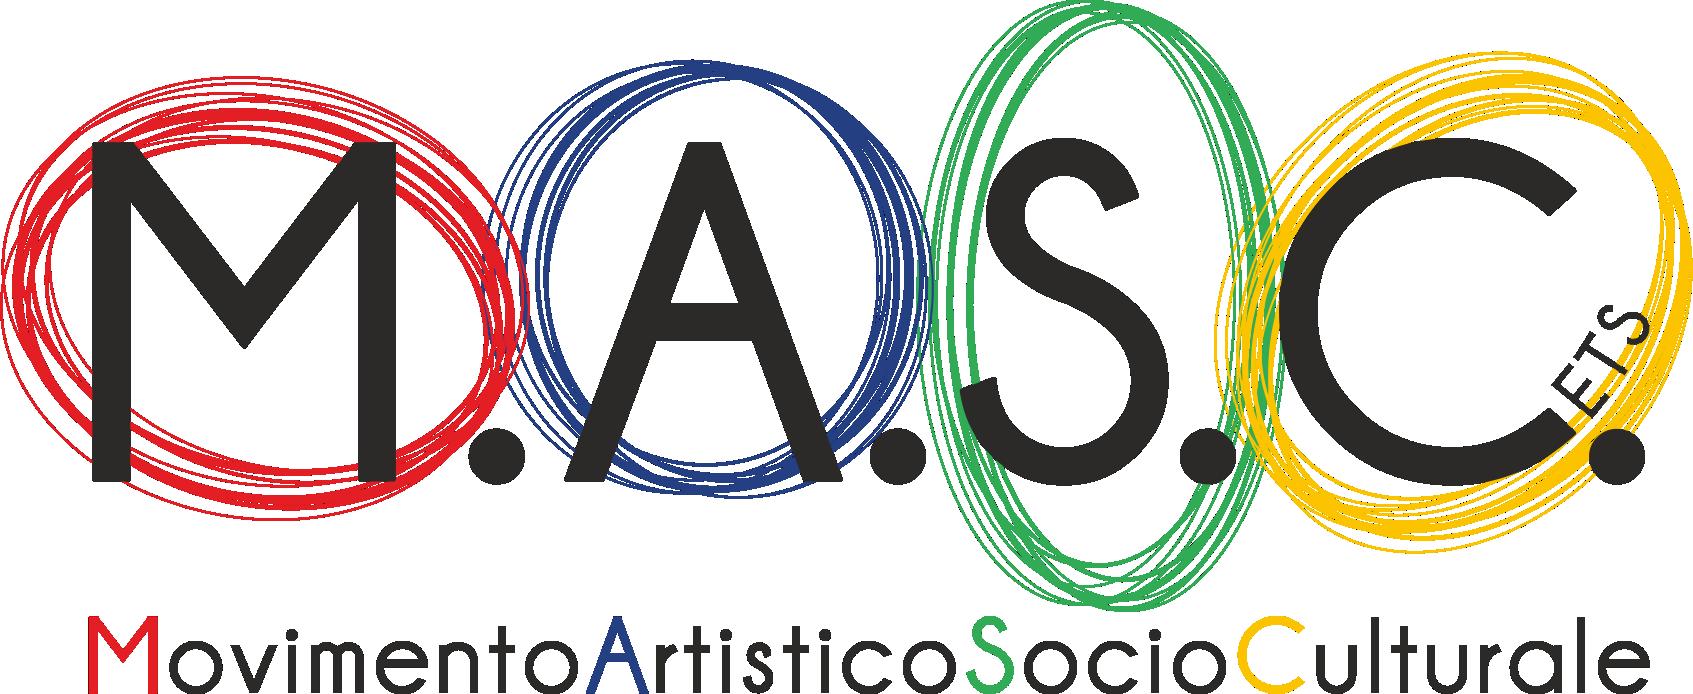 MASC logo ETS completo